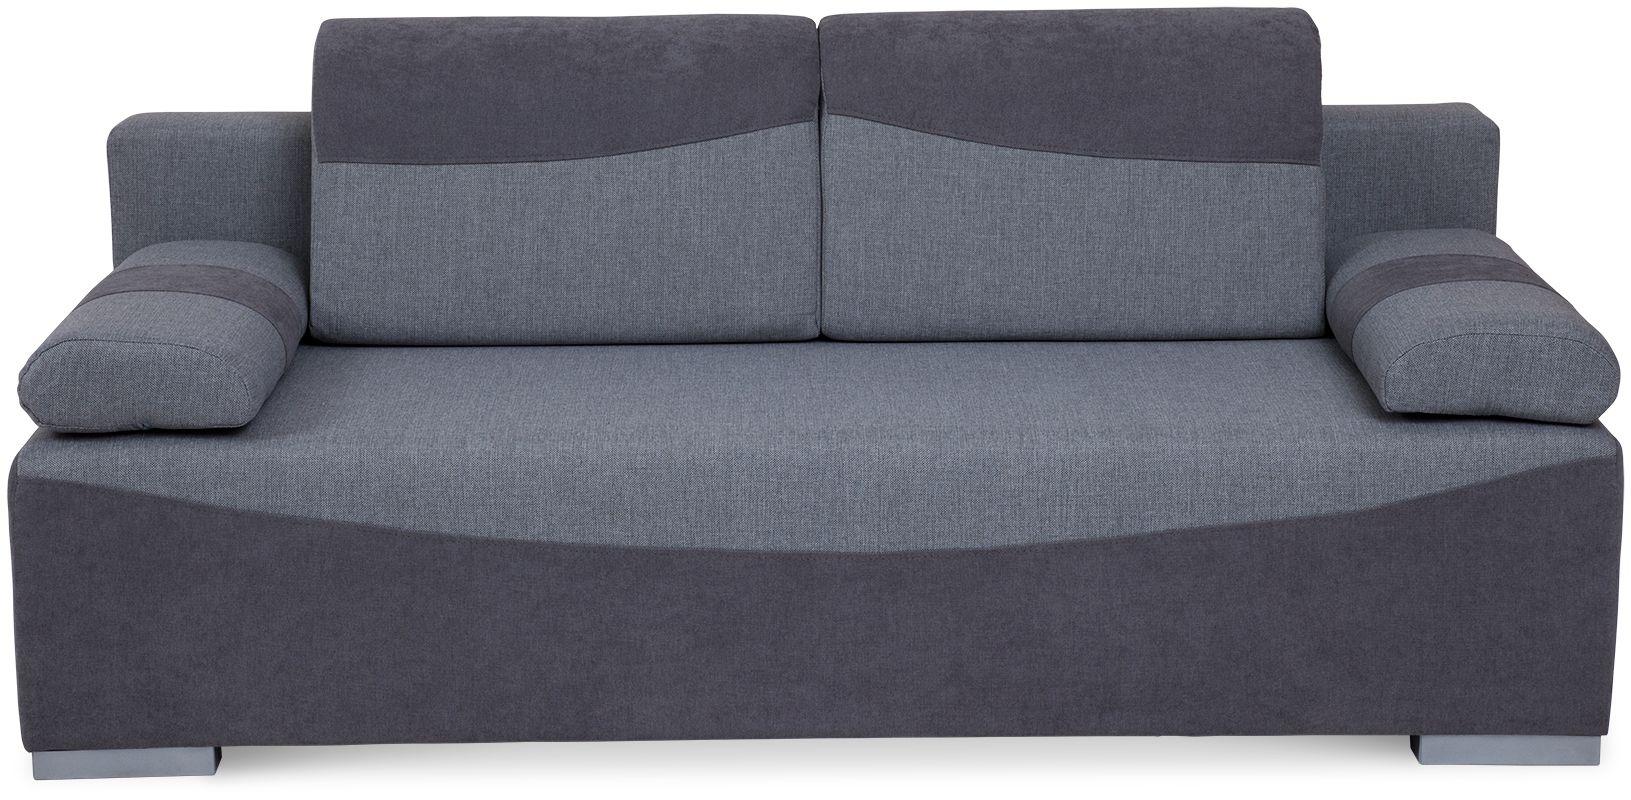 sofa sevia 2